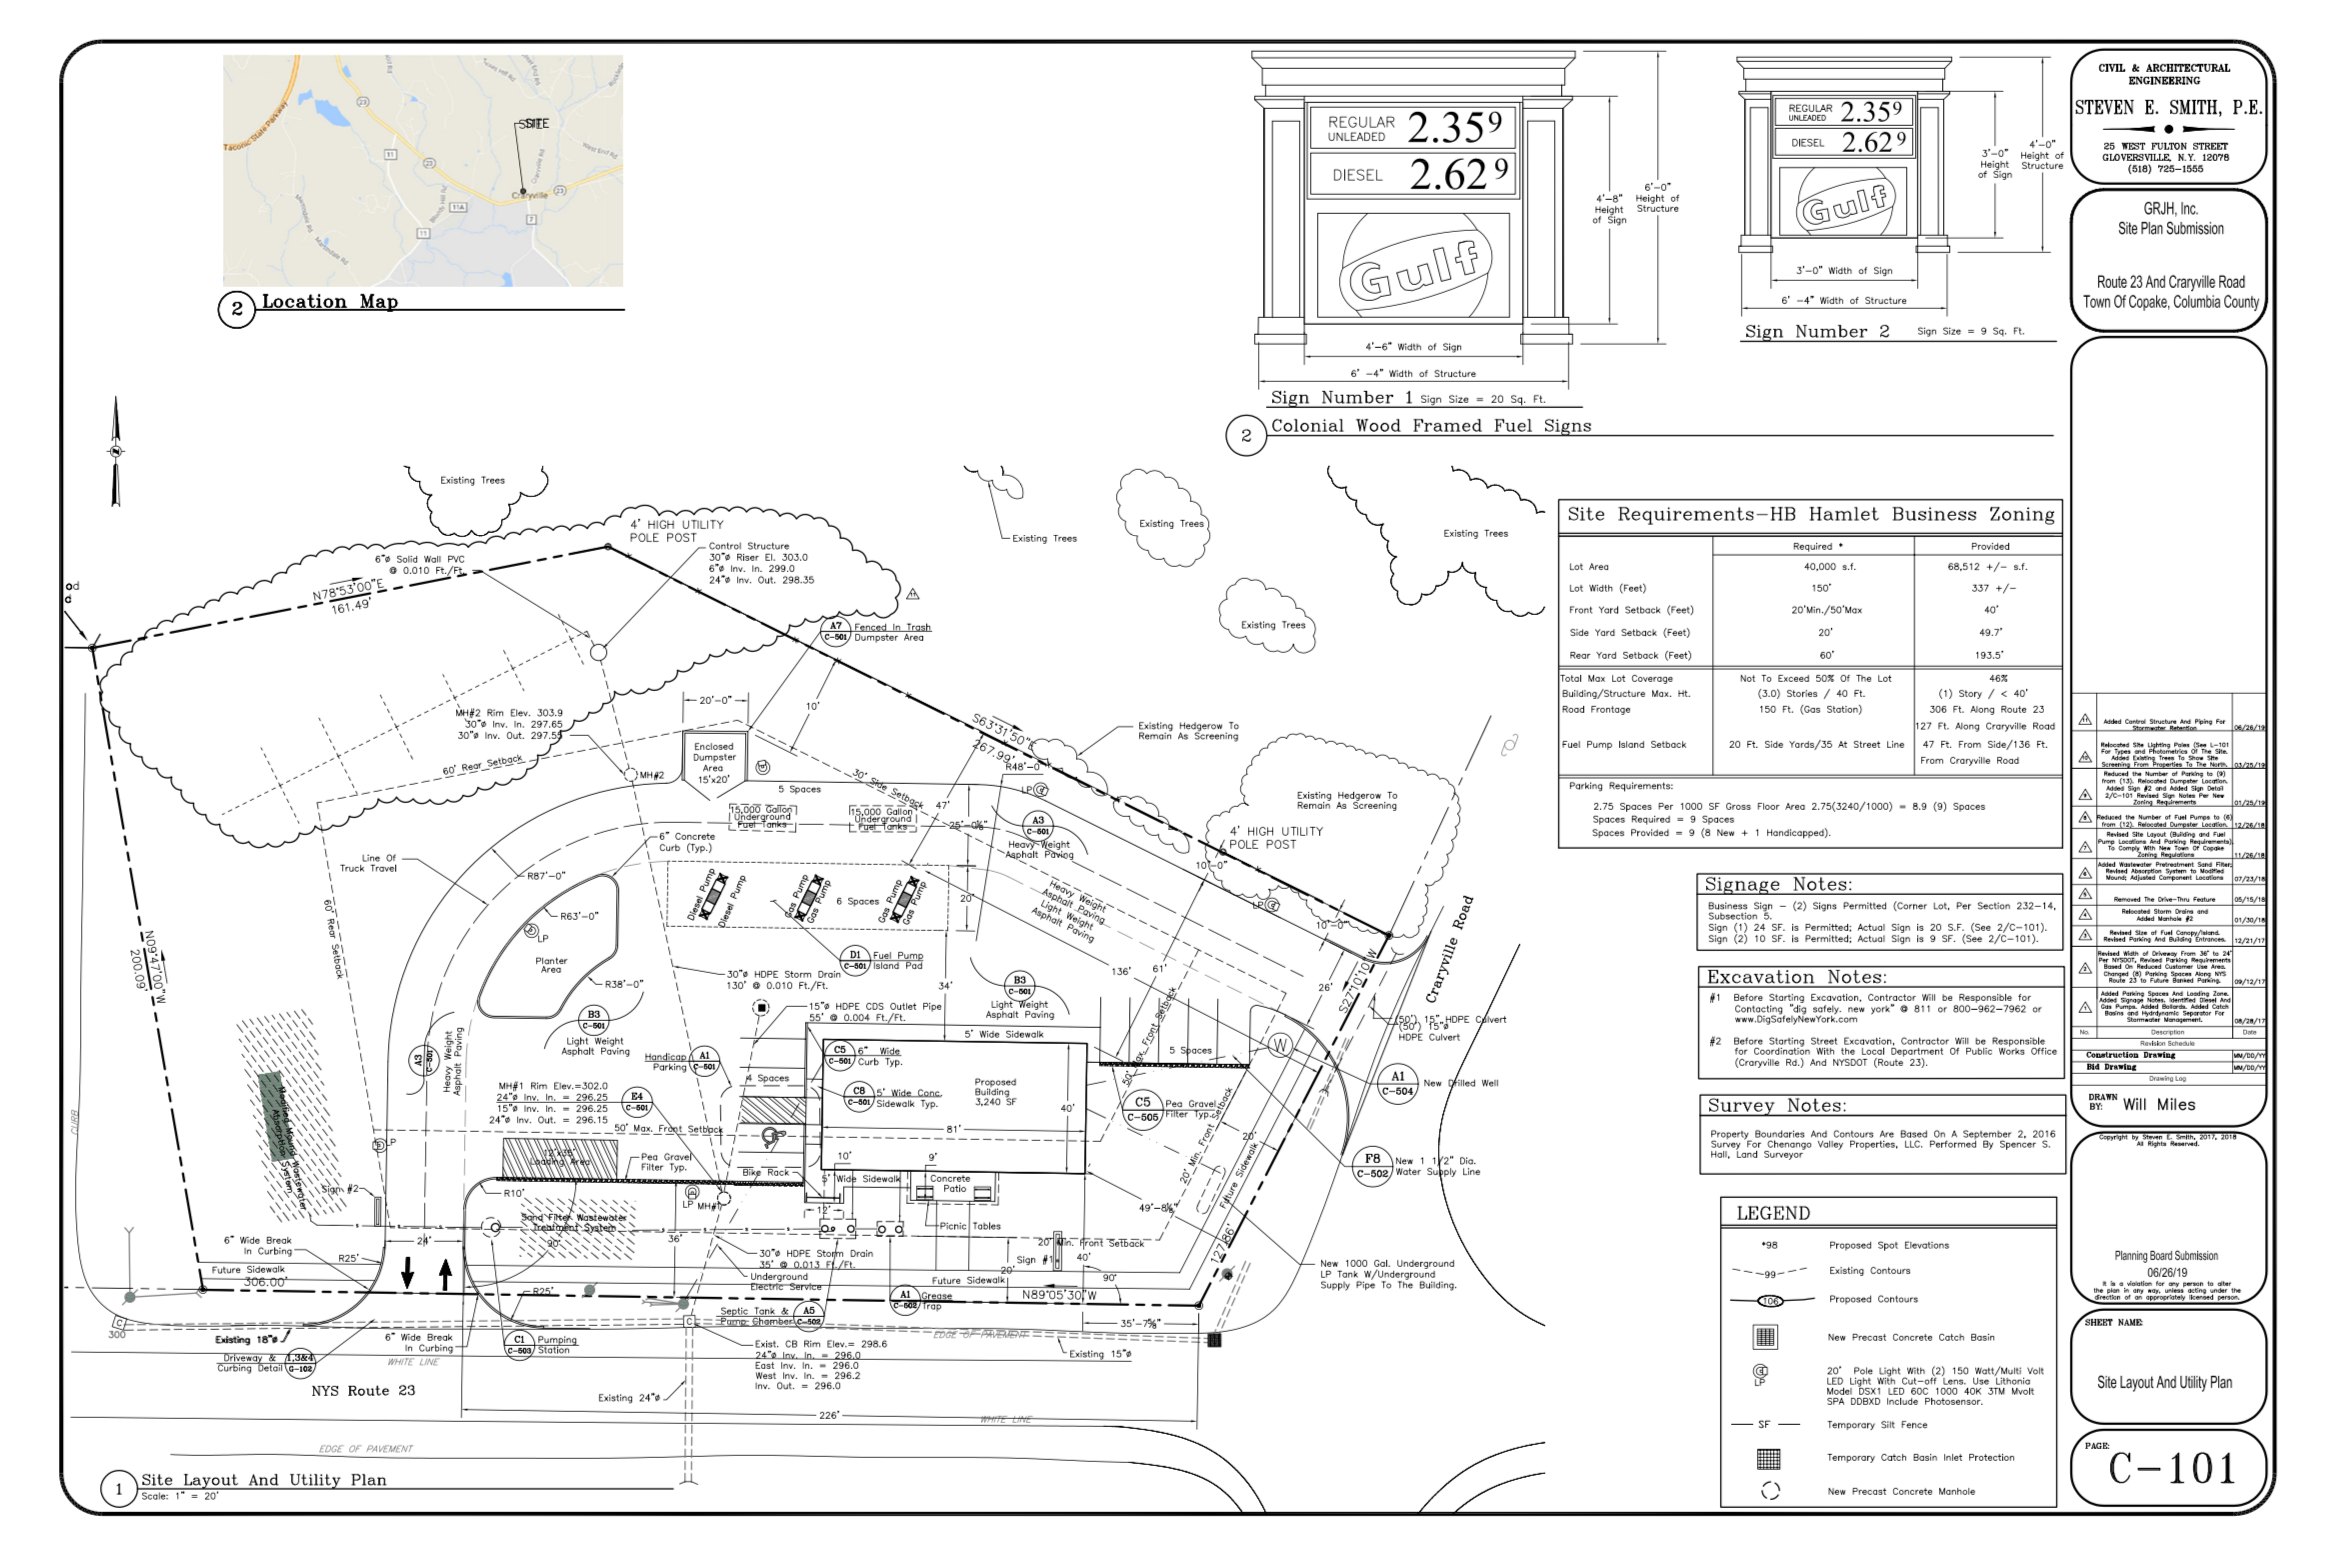 Site Plans GRJH Cobble Pond Gas Station_05.jpg